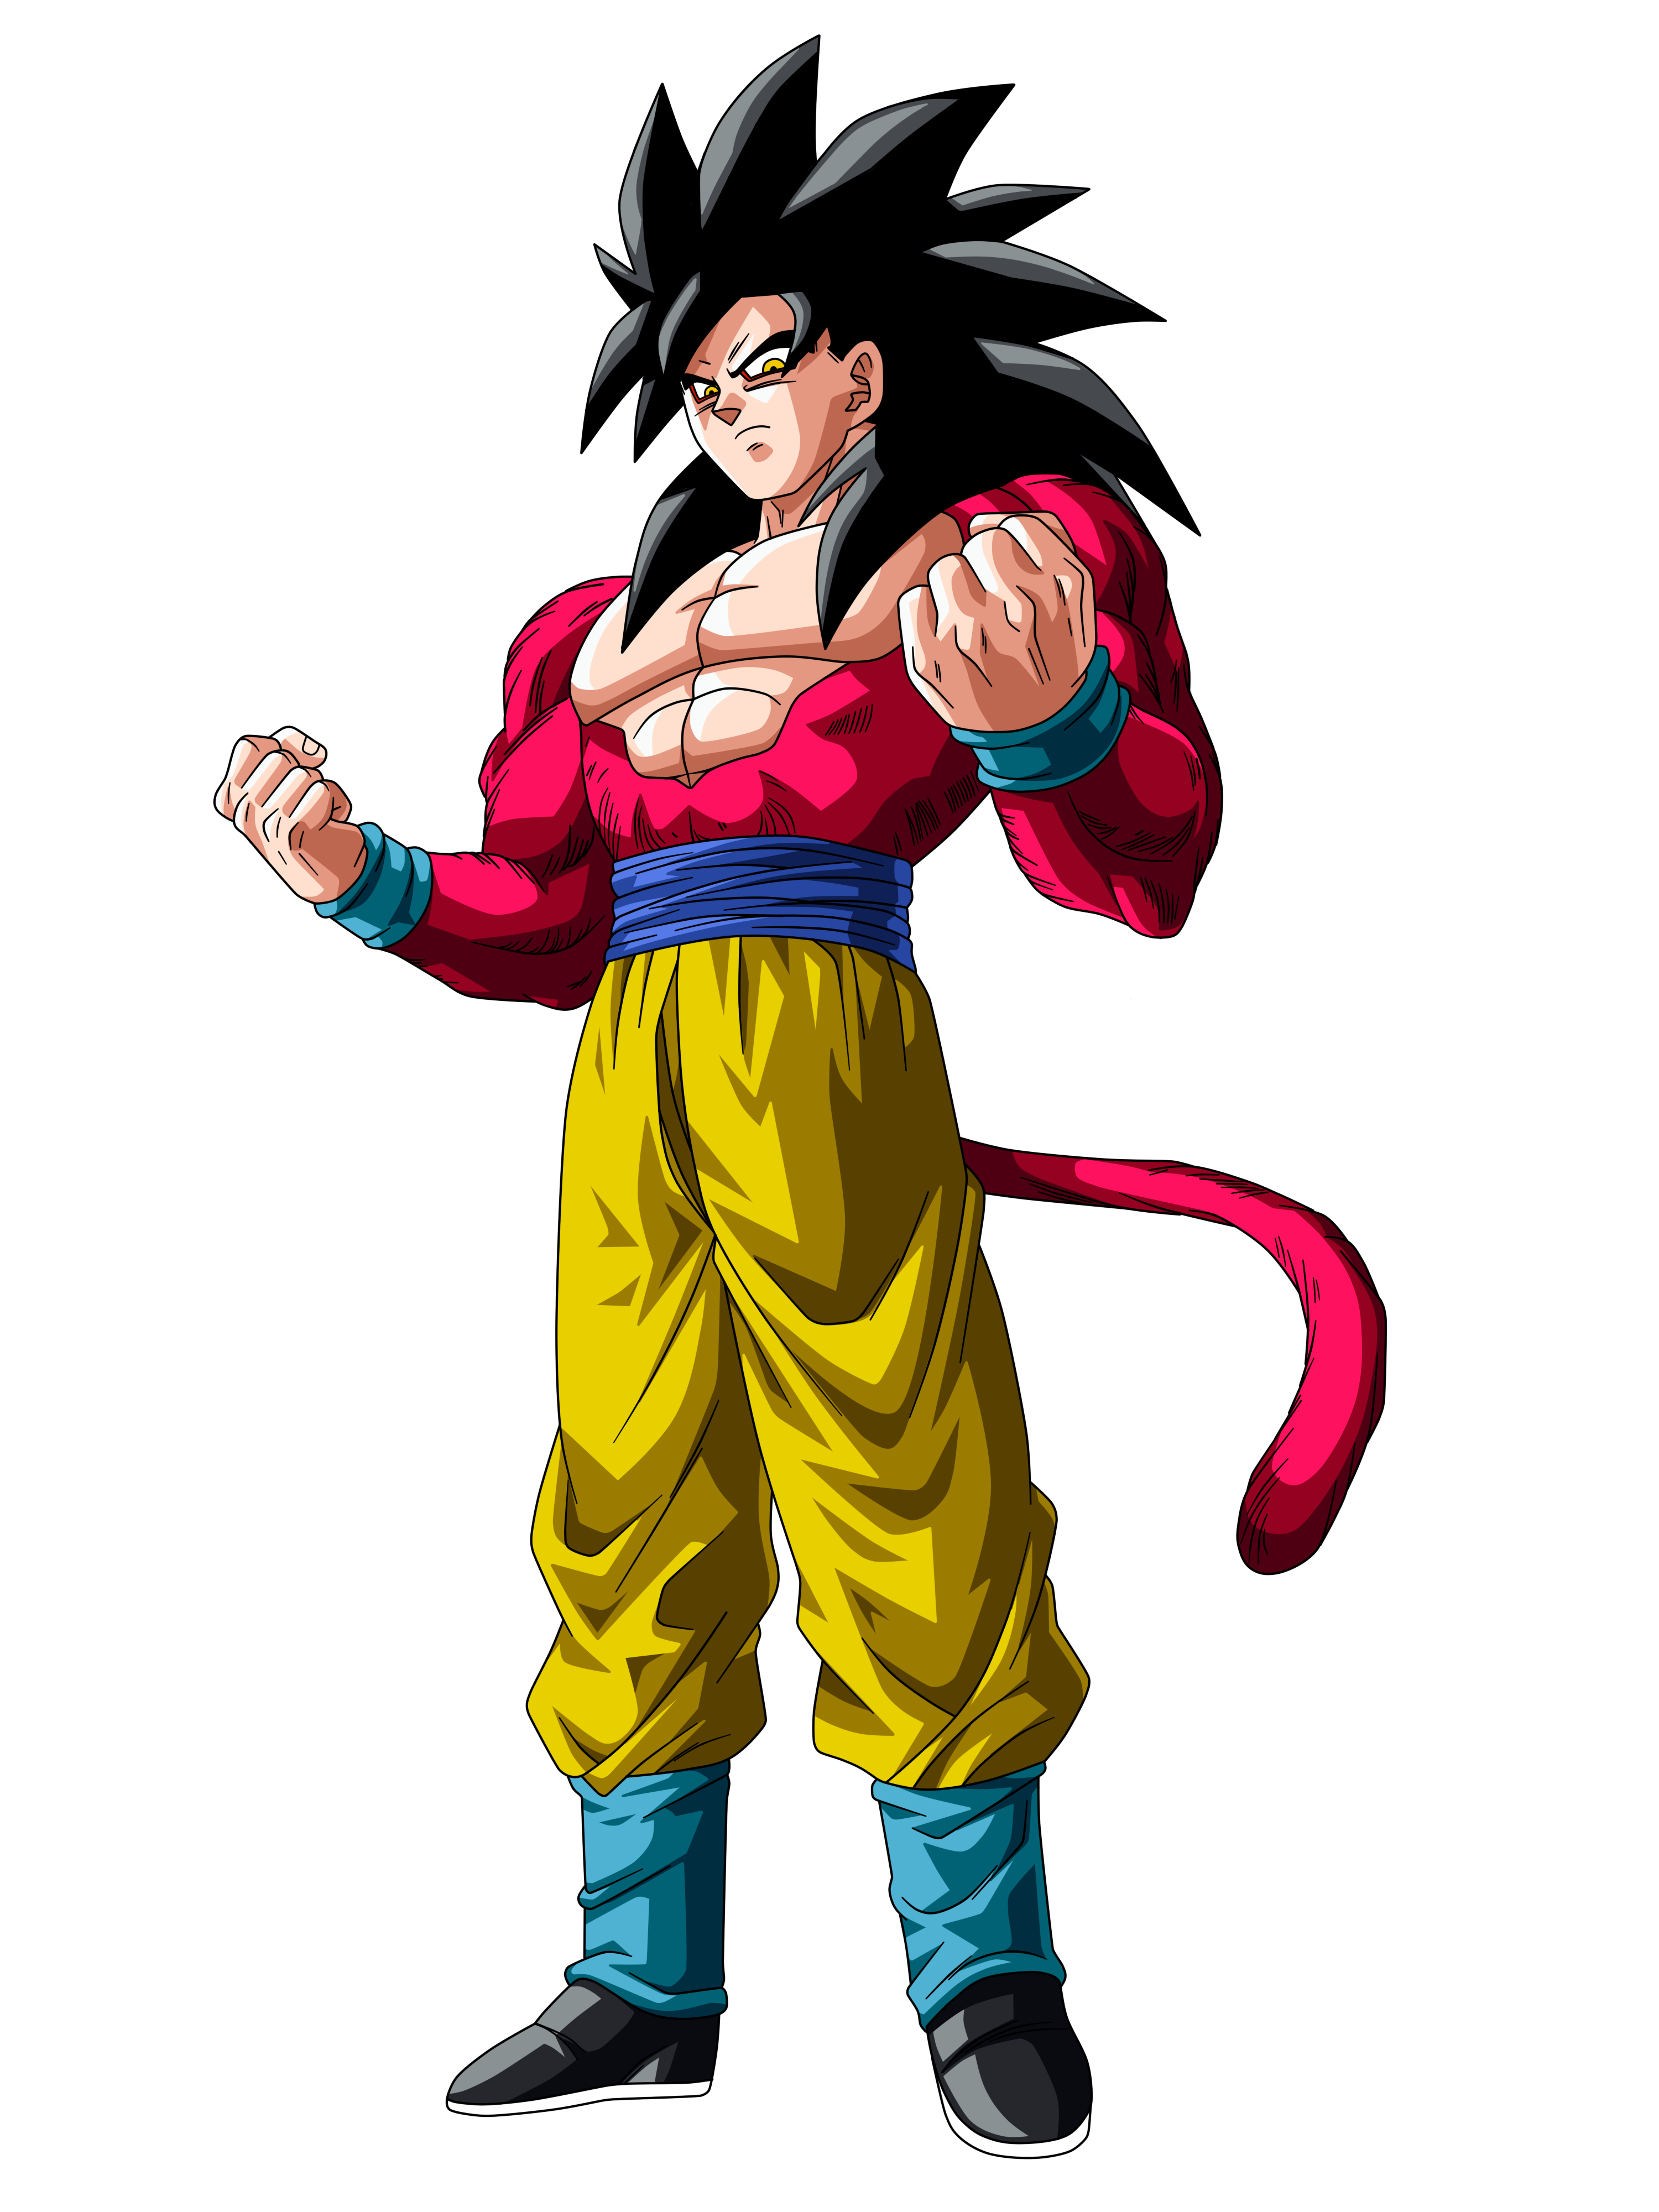 Goku Ssj4 Imagenes De Goku Super Goku Goku Super Saiyan